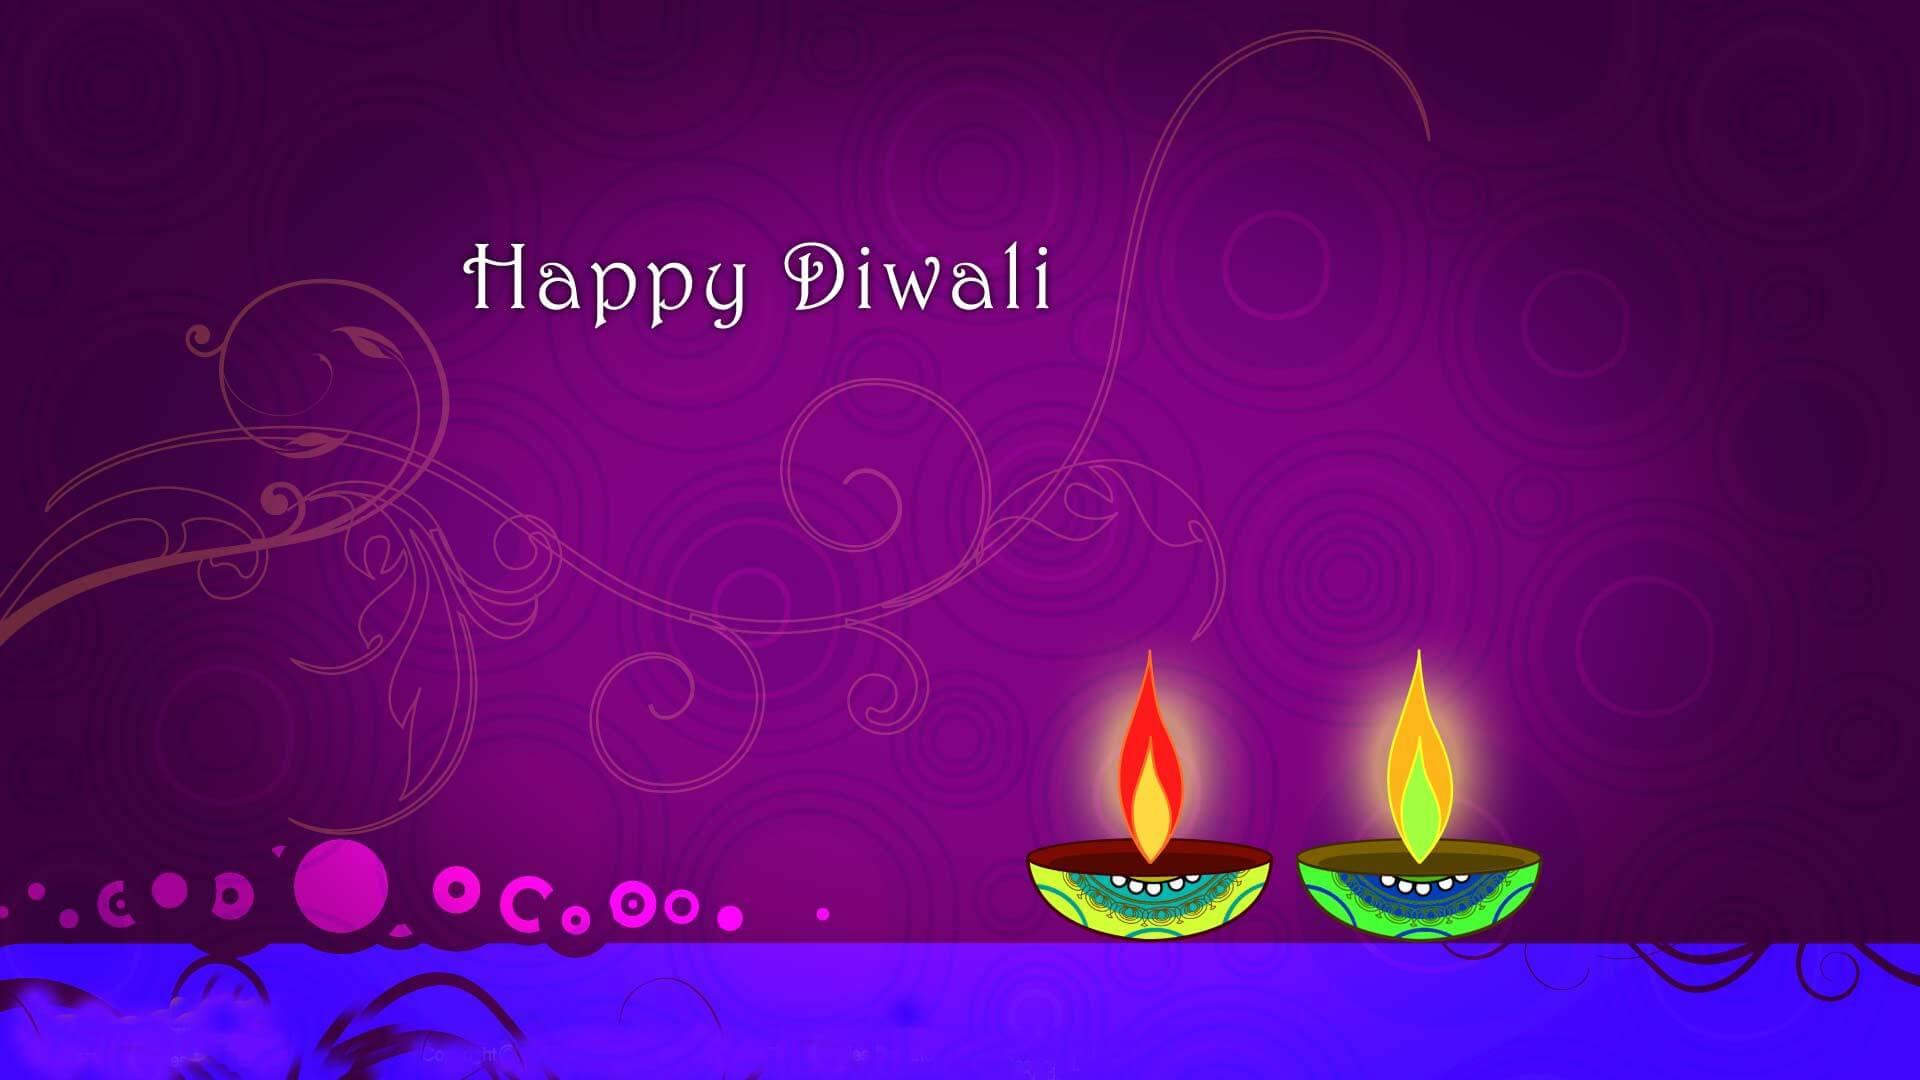 Happy diwali 2018 greeting card HD image